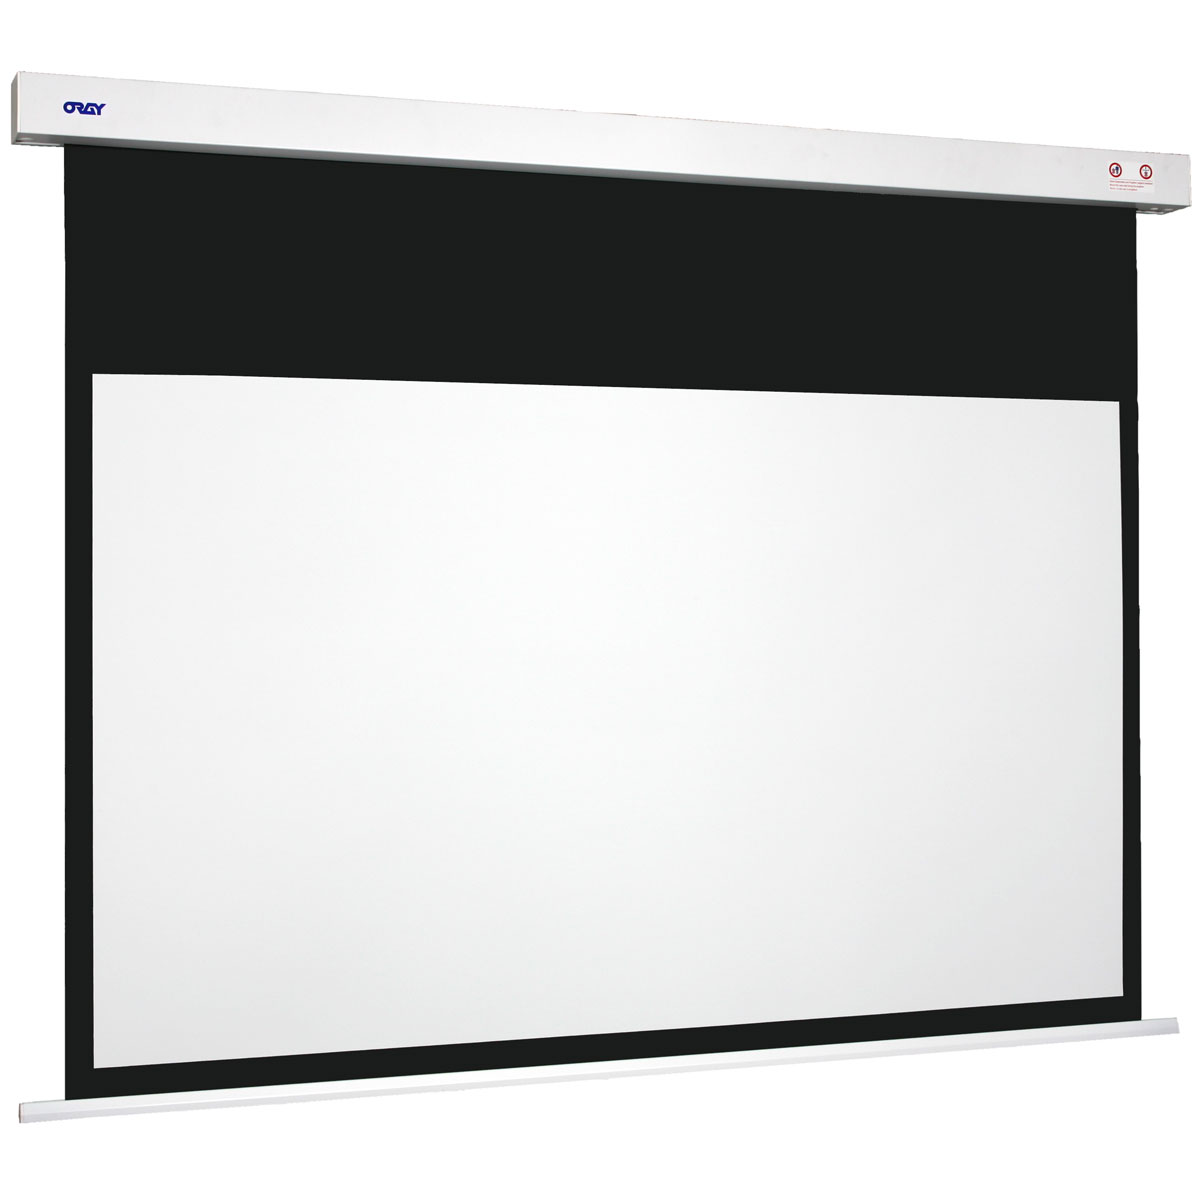 oray square hc 270 x 169 cm ecran de projection oray sur. Black Bedroom Furniture Sets. Home Design Ideas